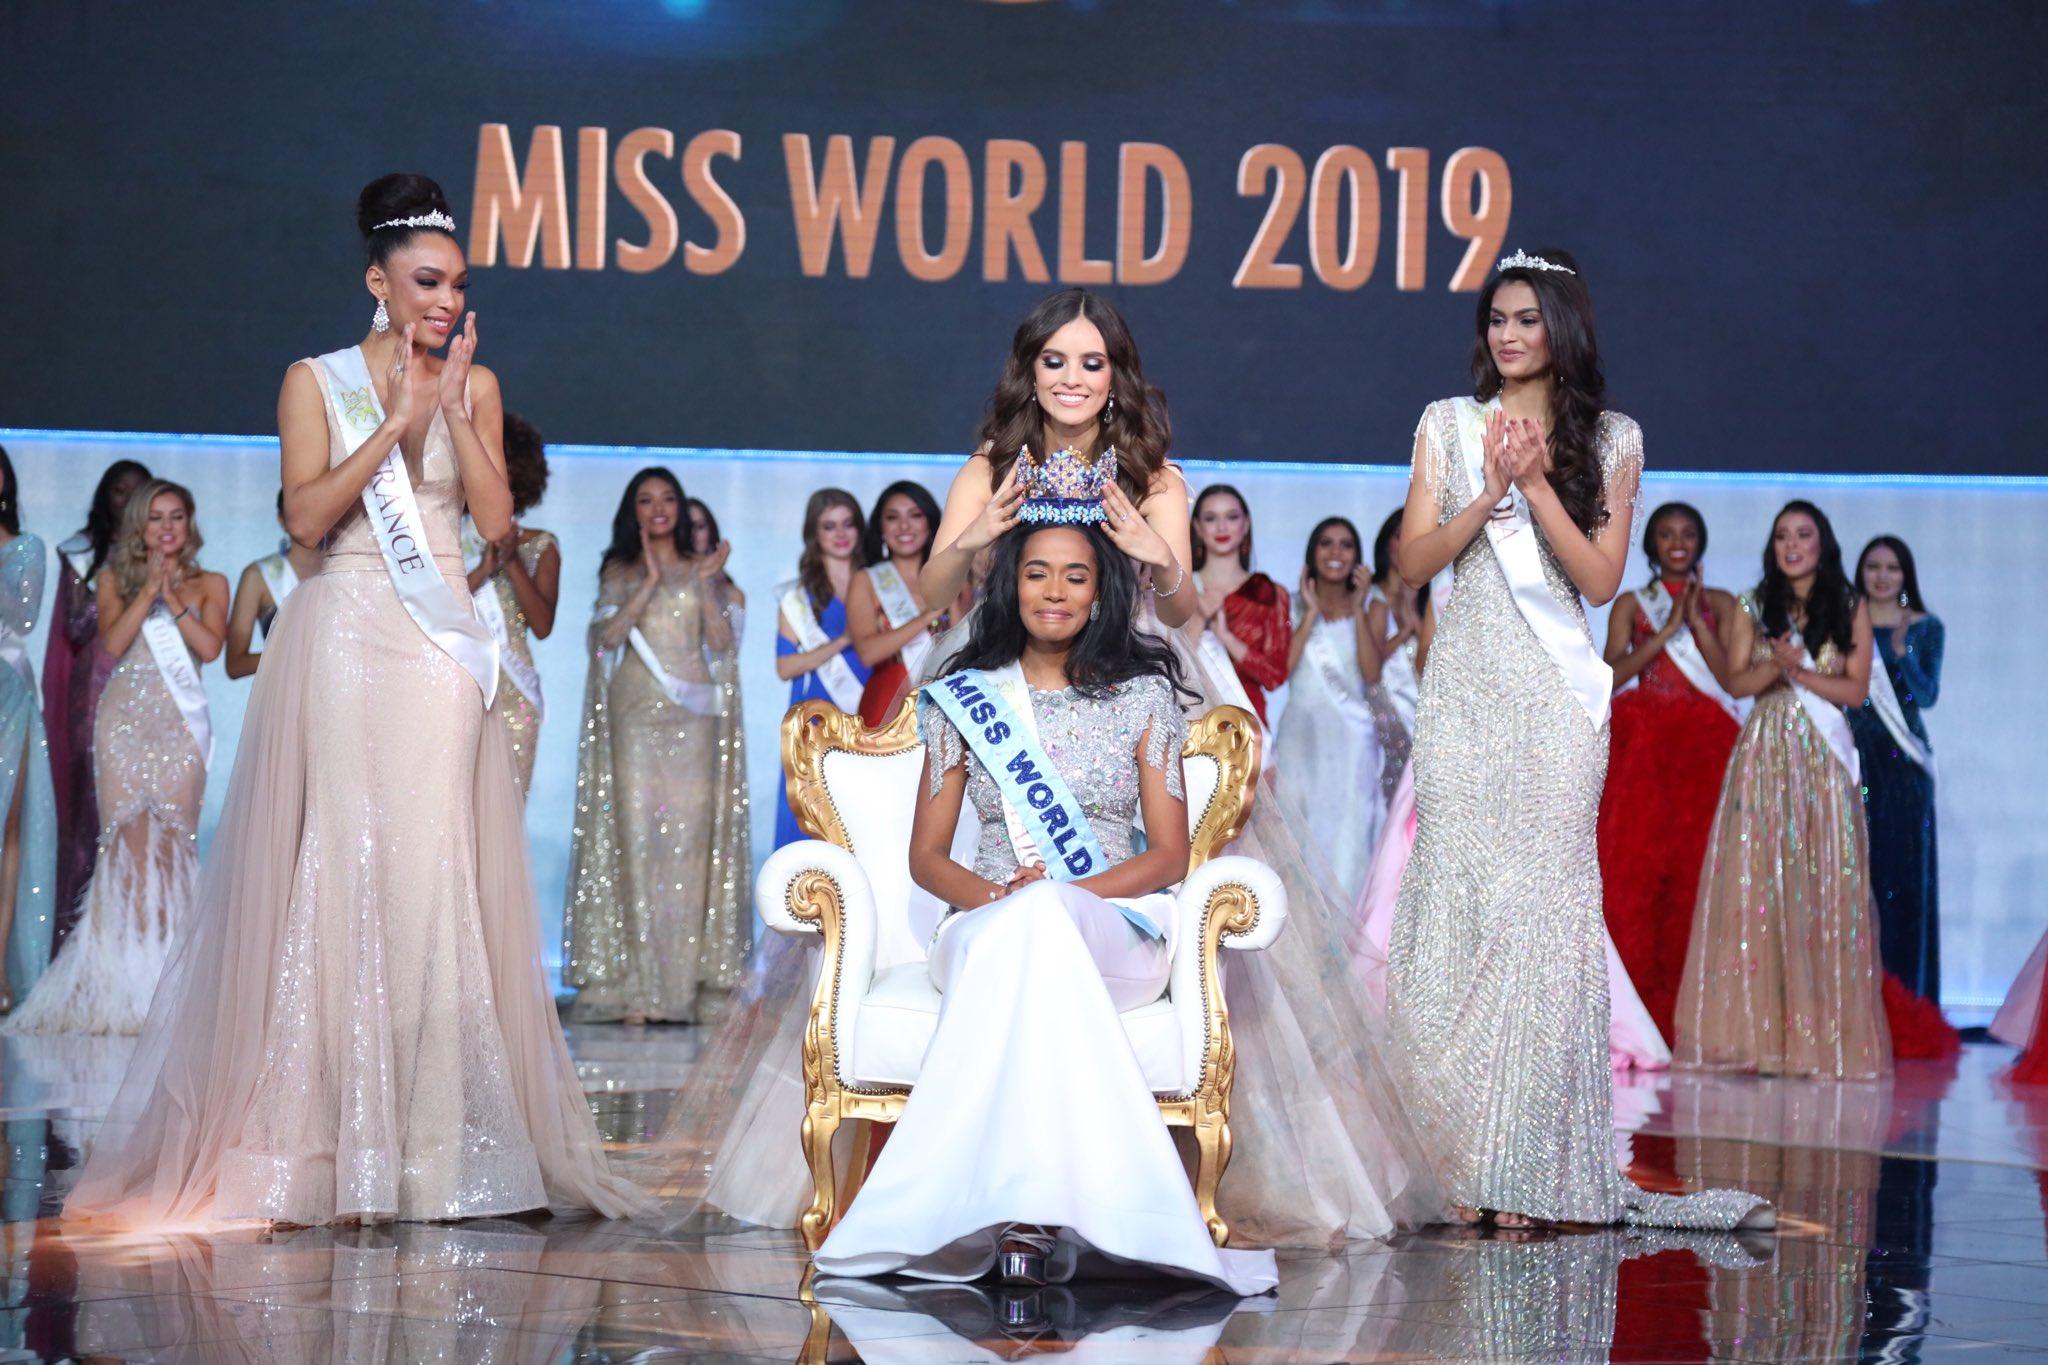 toni-ann singh, miss world 2019. - Página 3 Elxeiq10